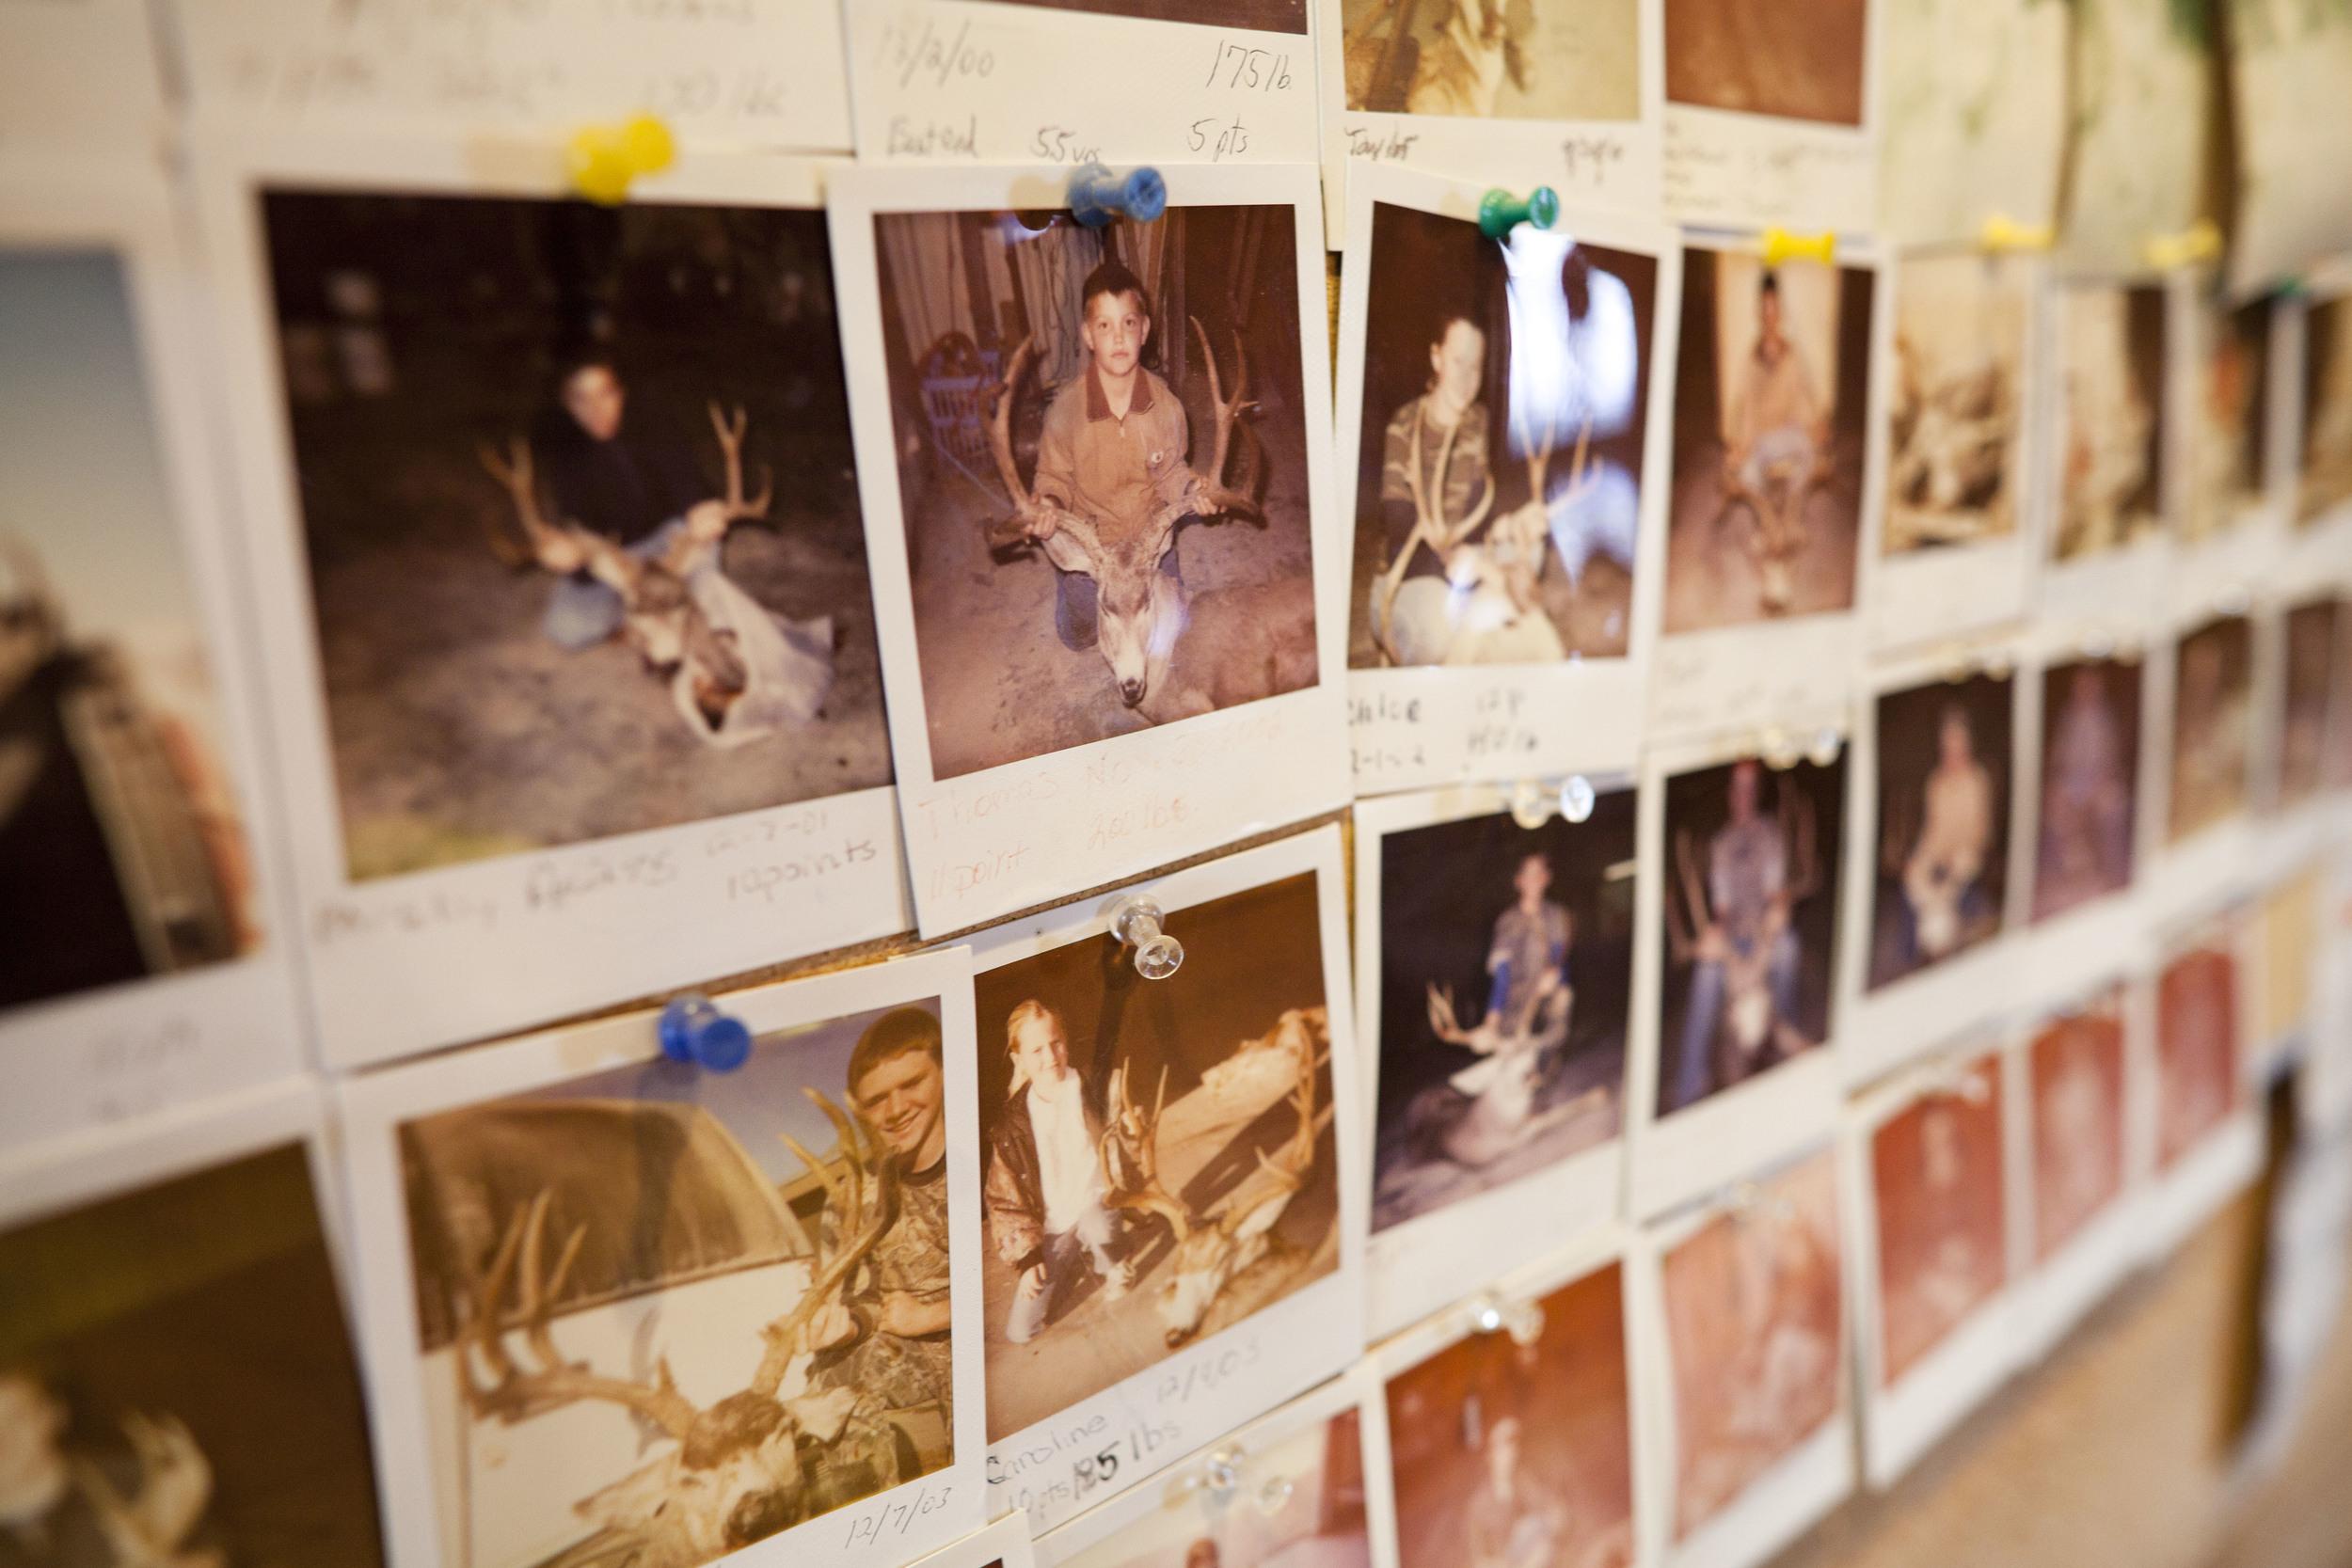 USA. Texas. Marfa. August 2013. Polaroid photos of shot deer.